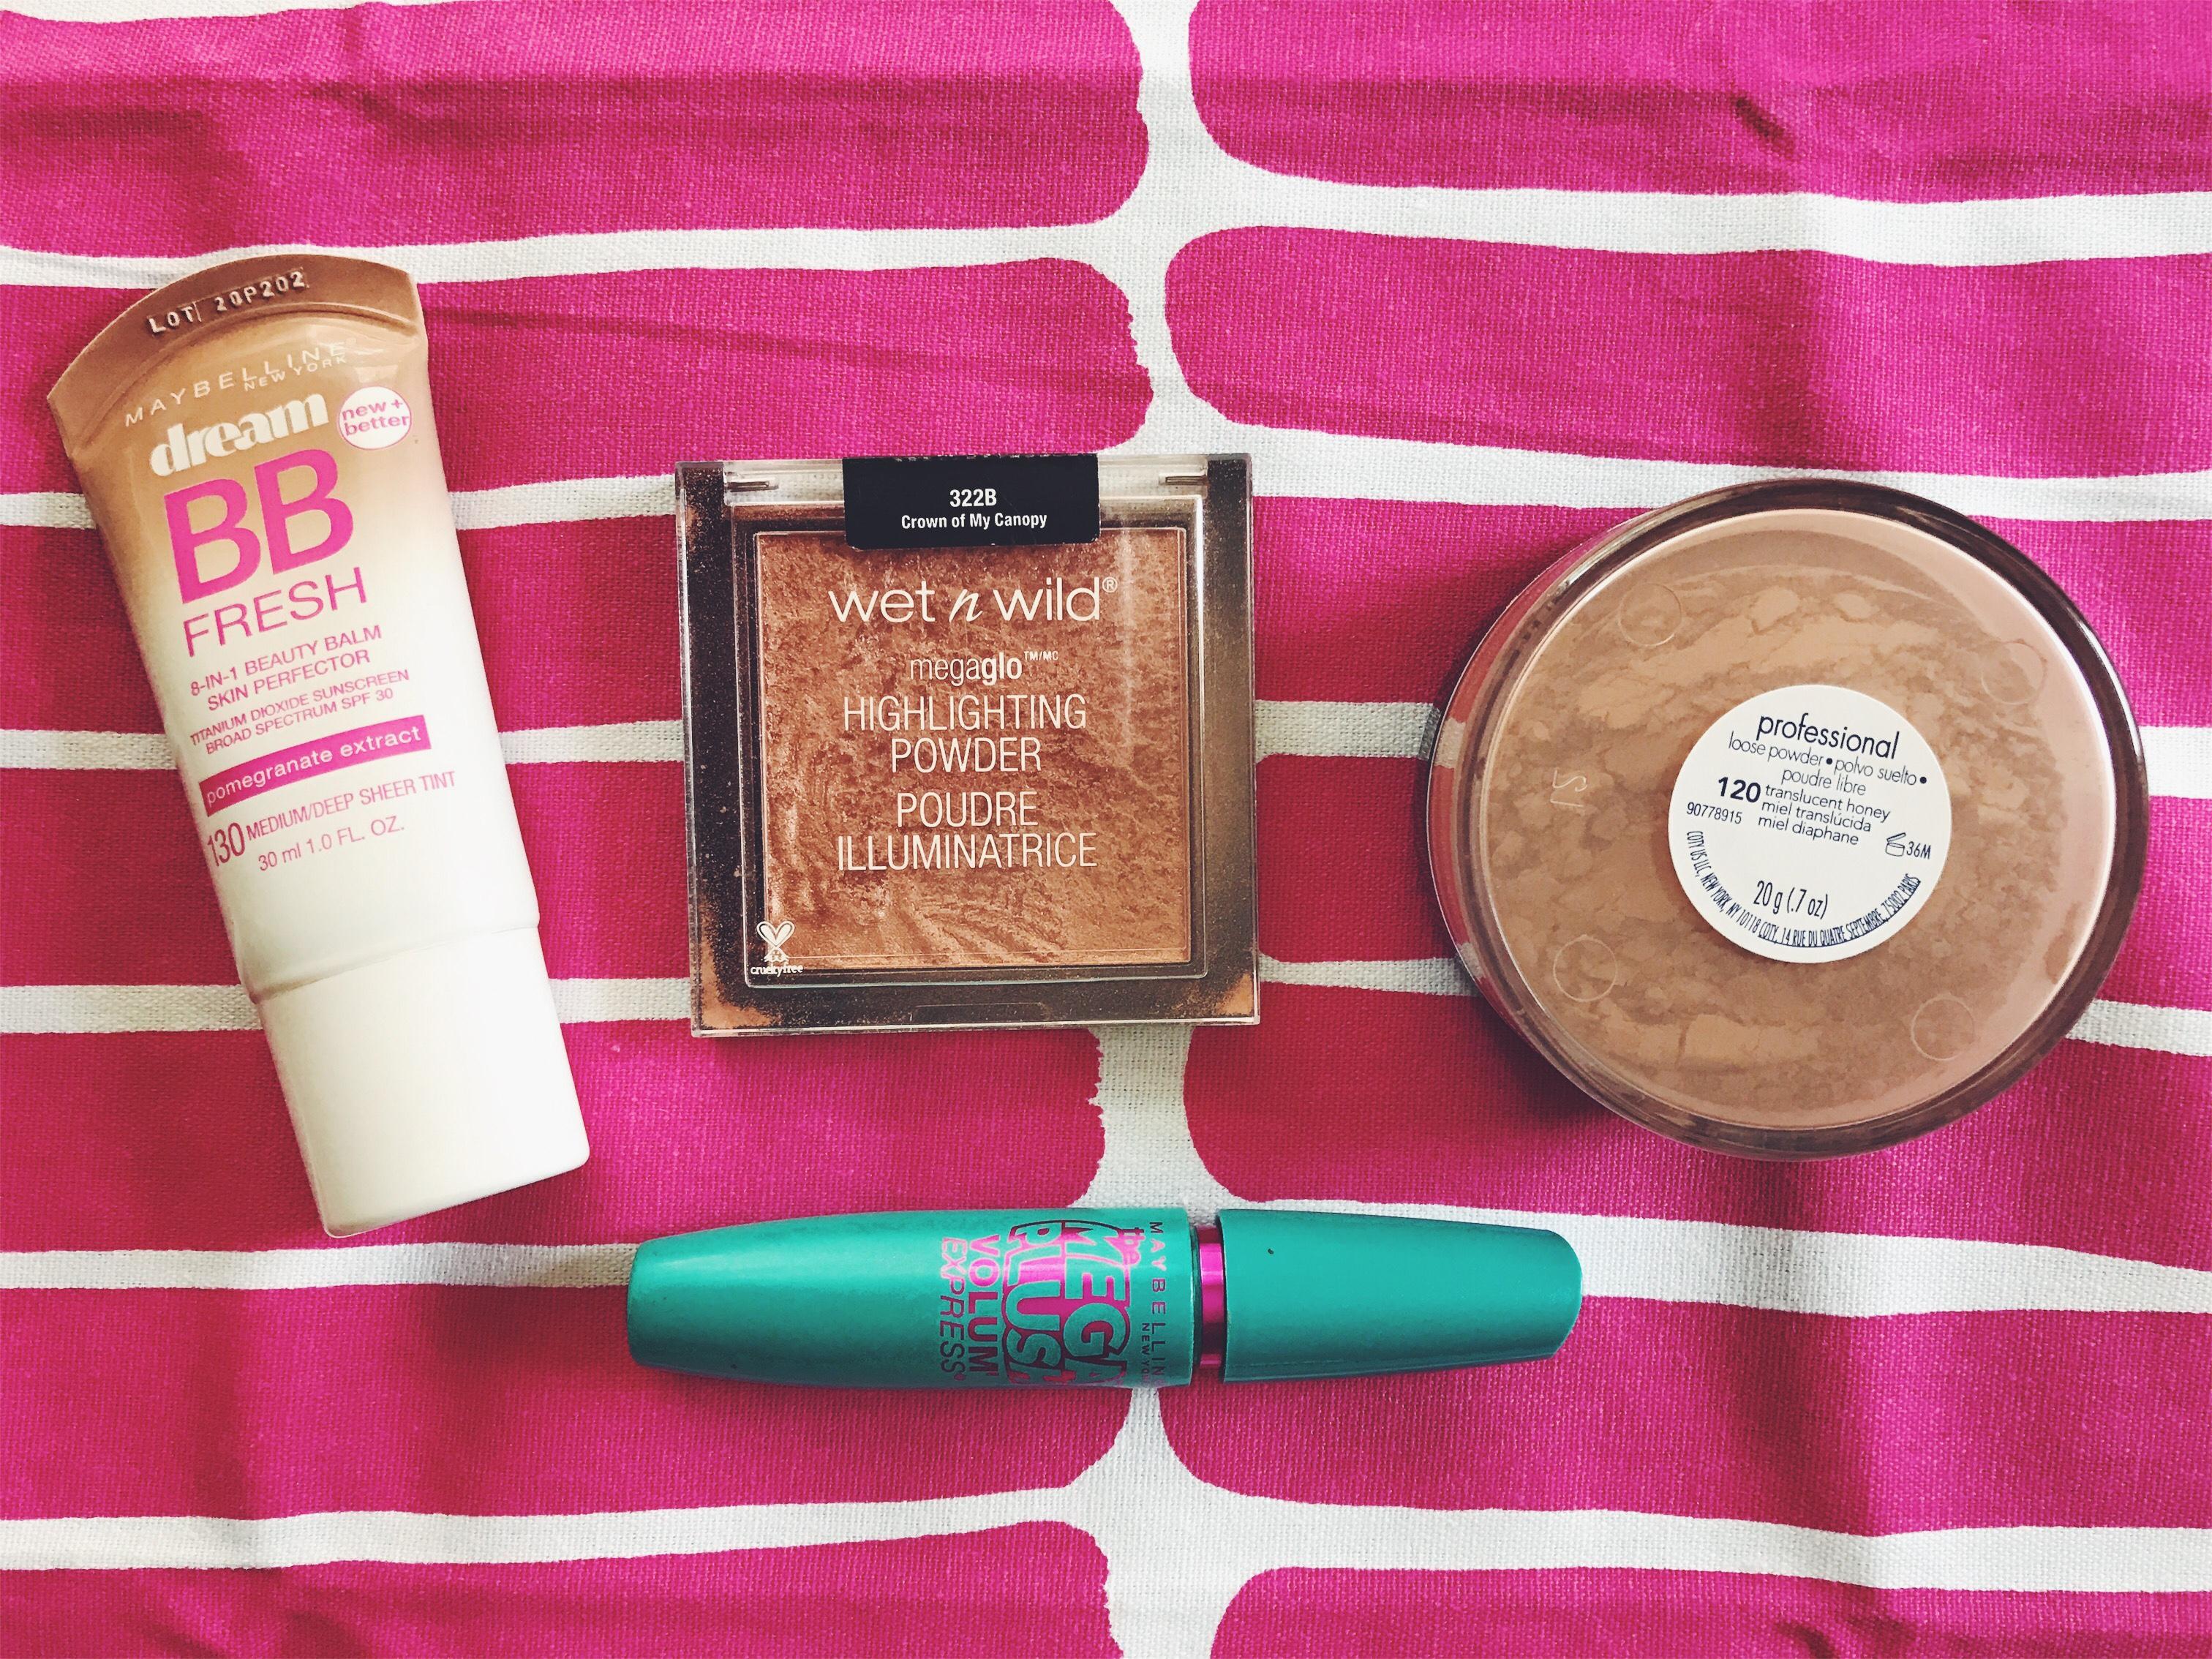 Priya the Blog, Nashville beauty blogger, August 2017 update, August 2017 beauty buzz